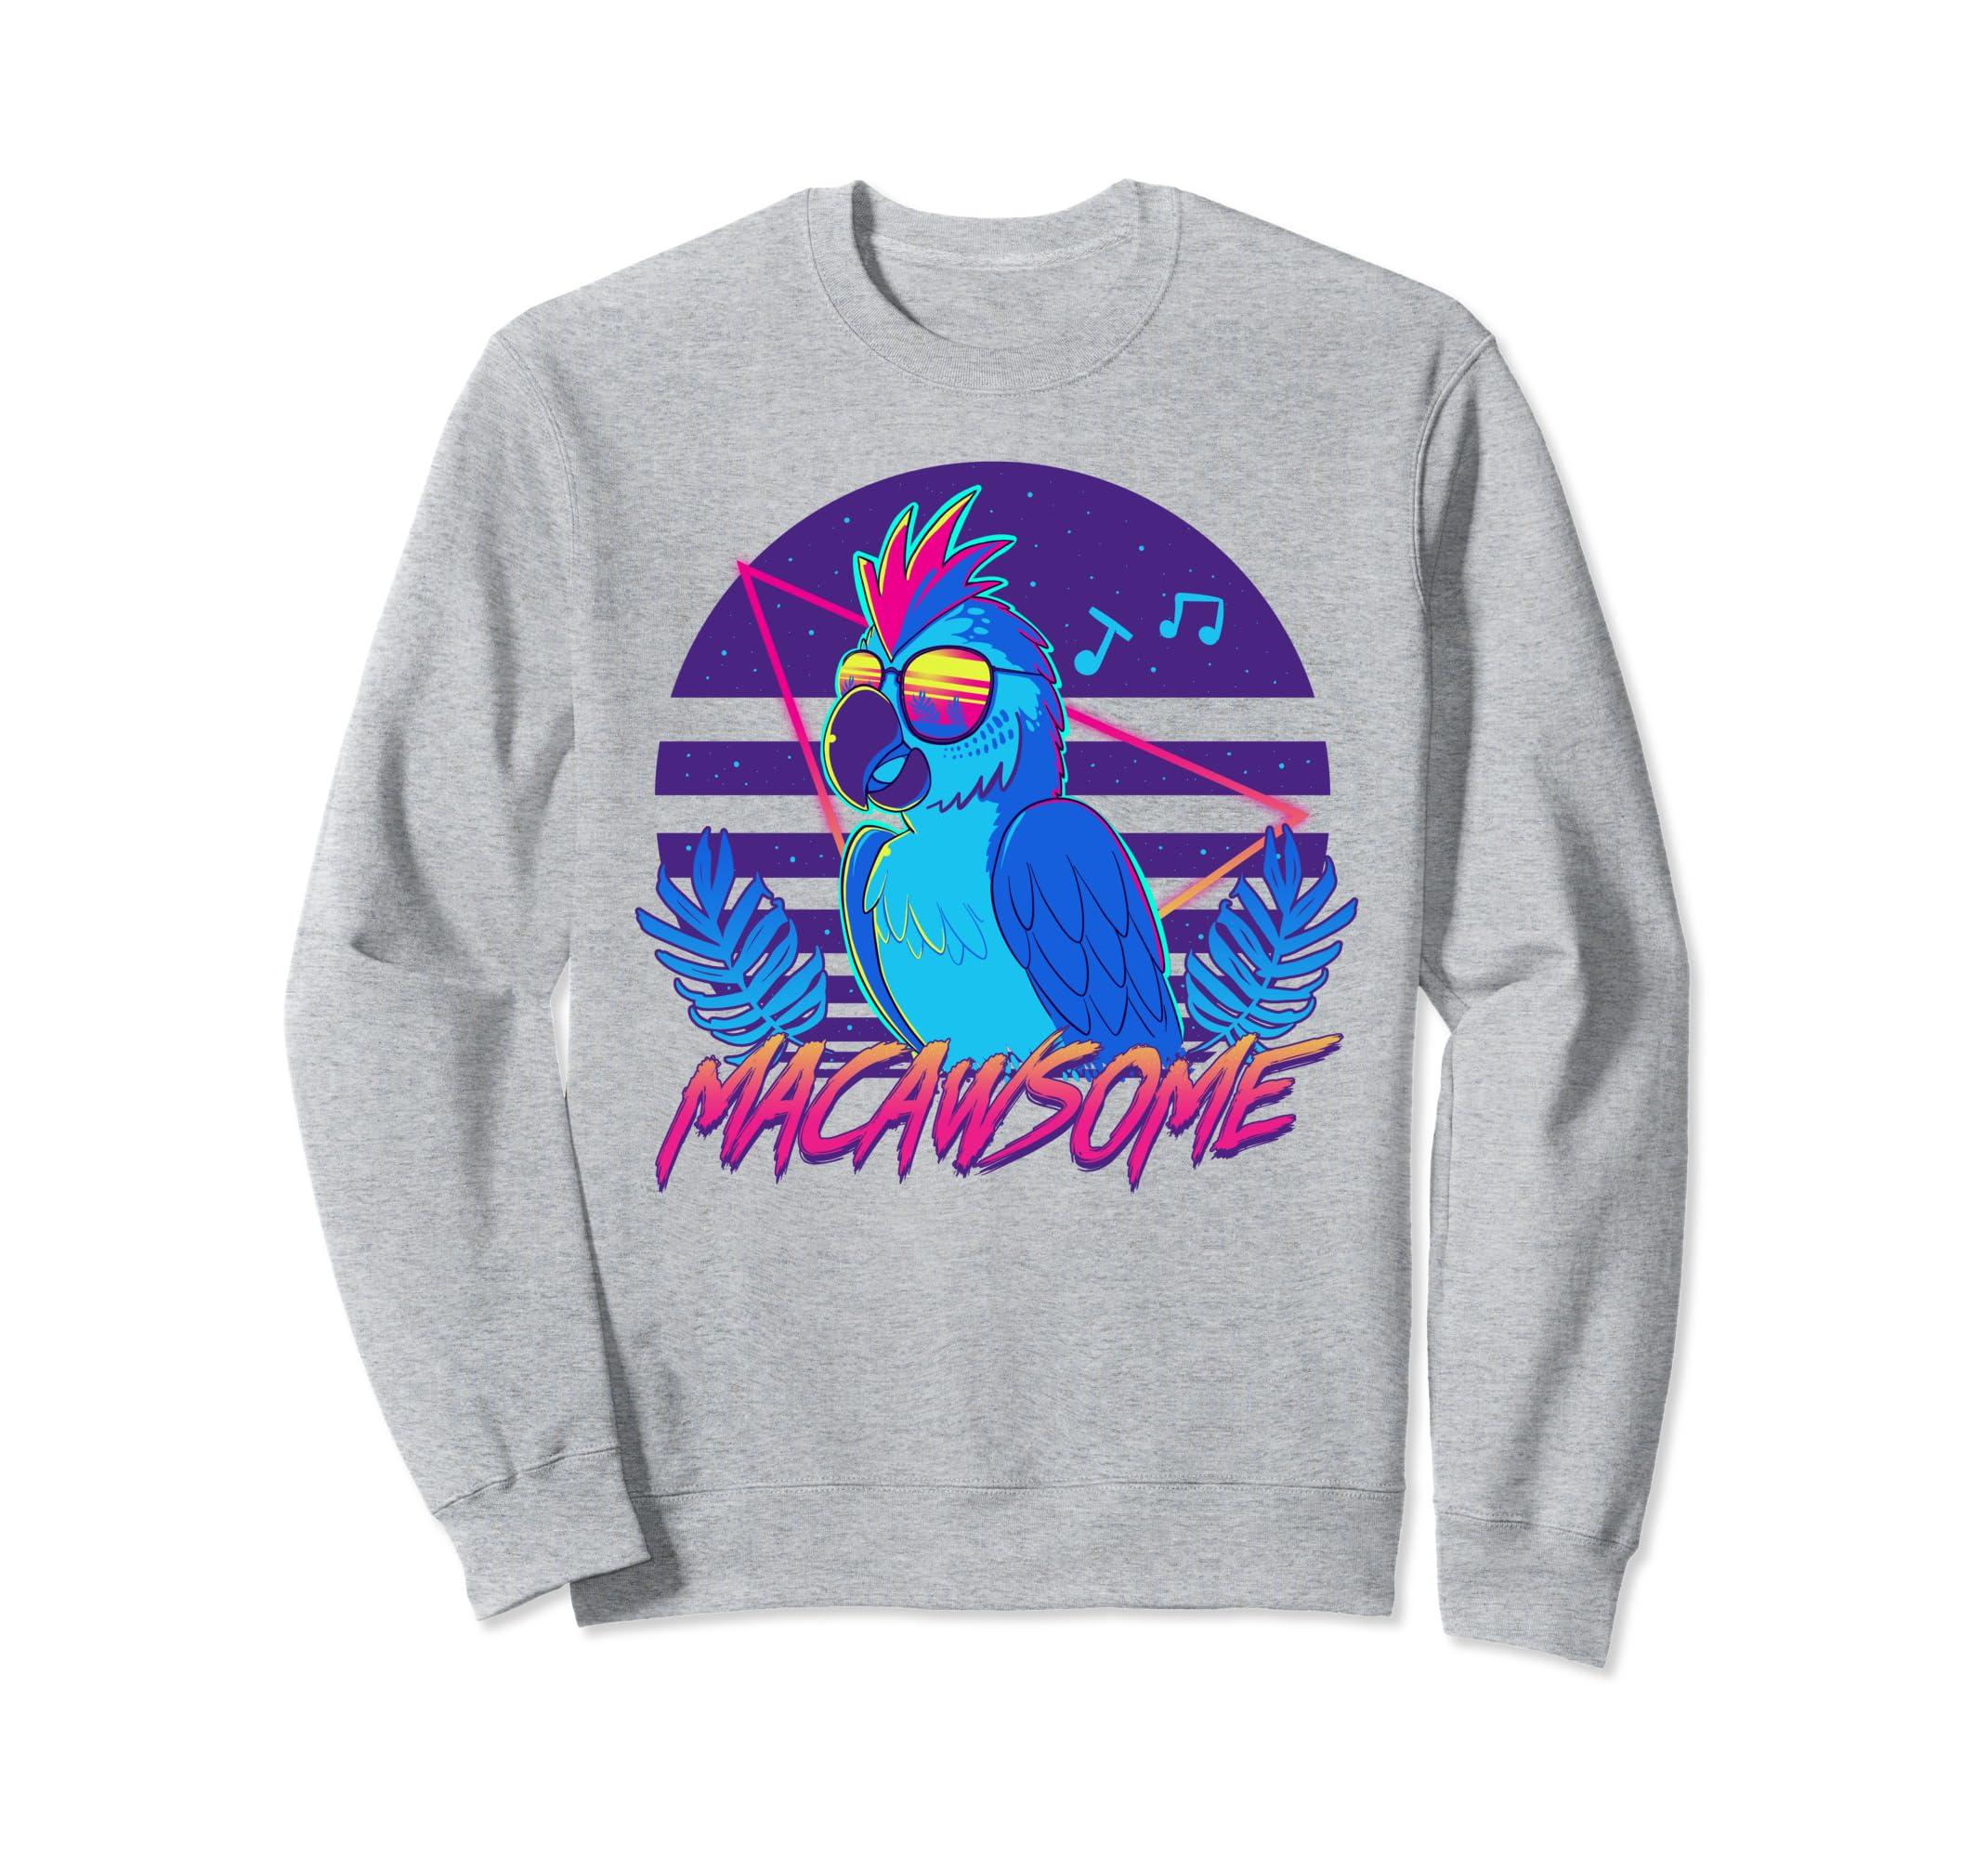 571f38ae934c Amazon.com  Macawsome - Macaw Parrot Retrowave 80s - Sweatshirt  Clothing